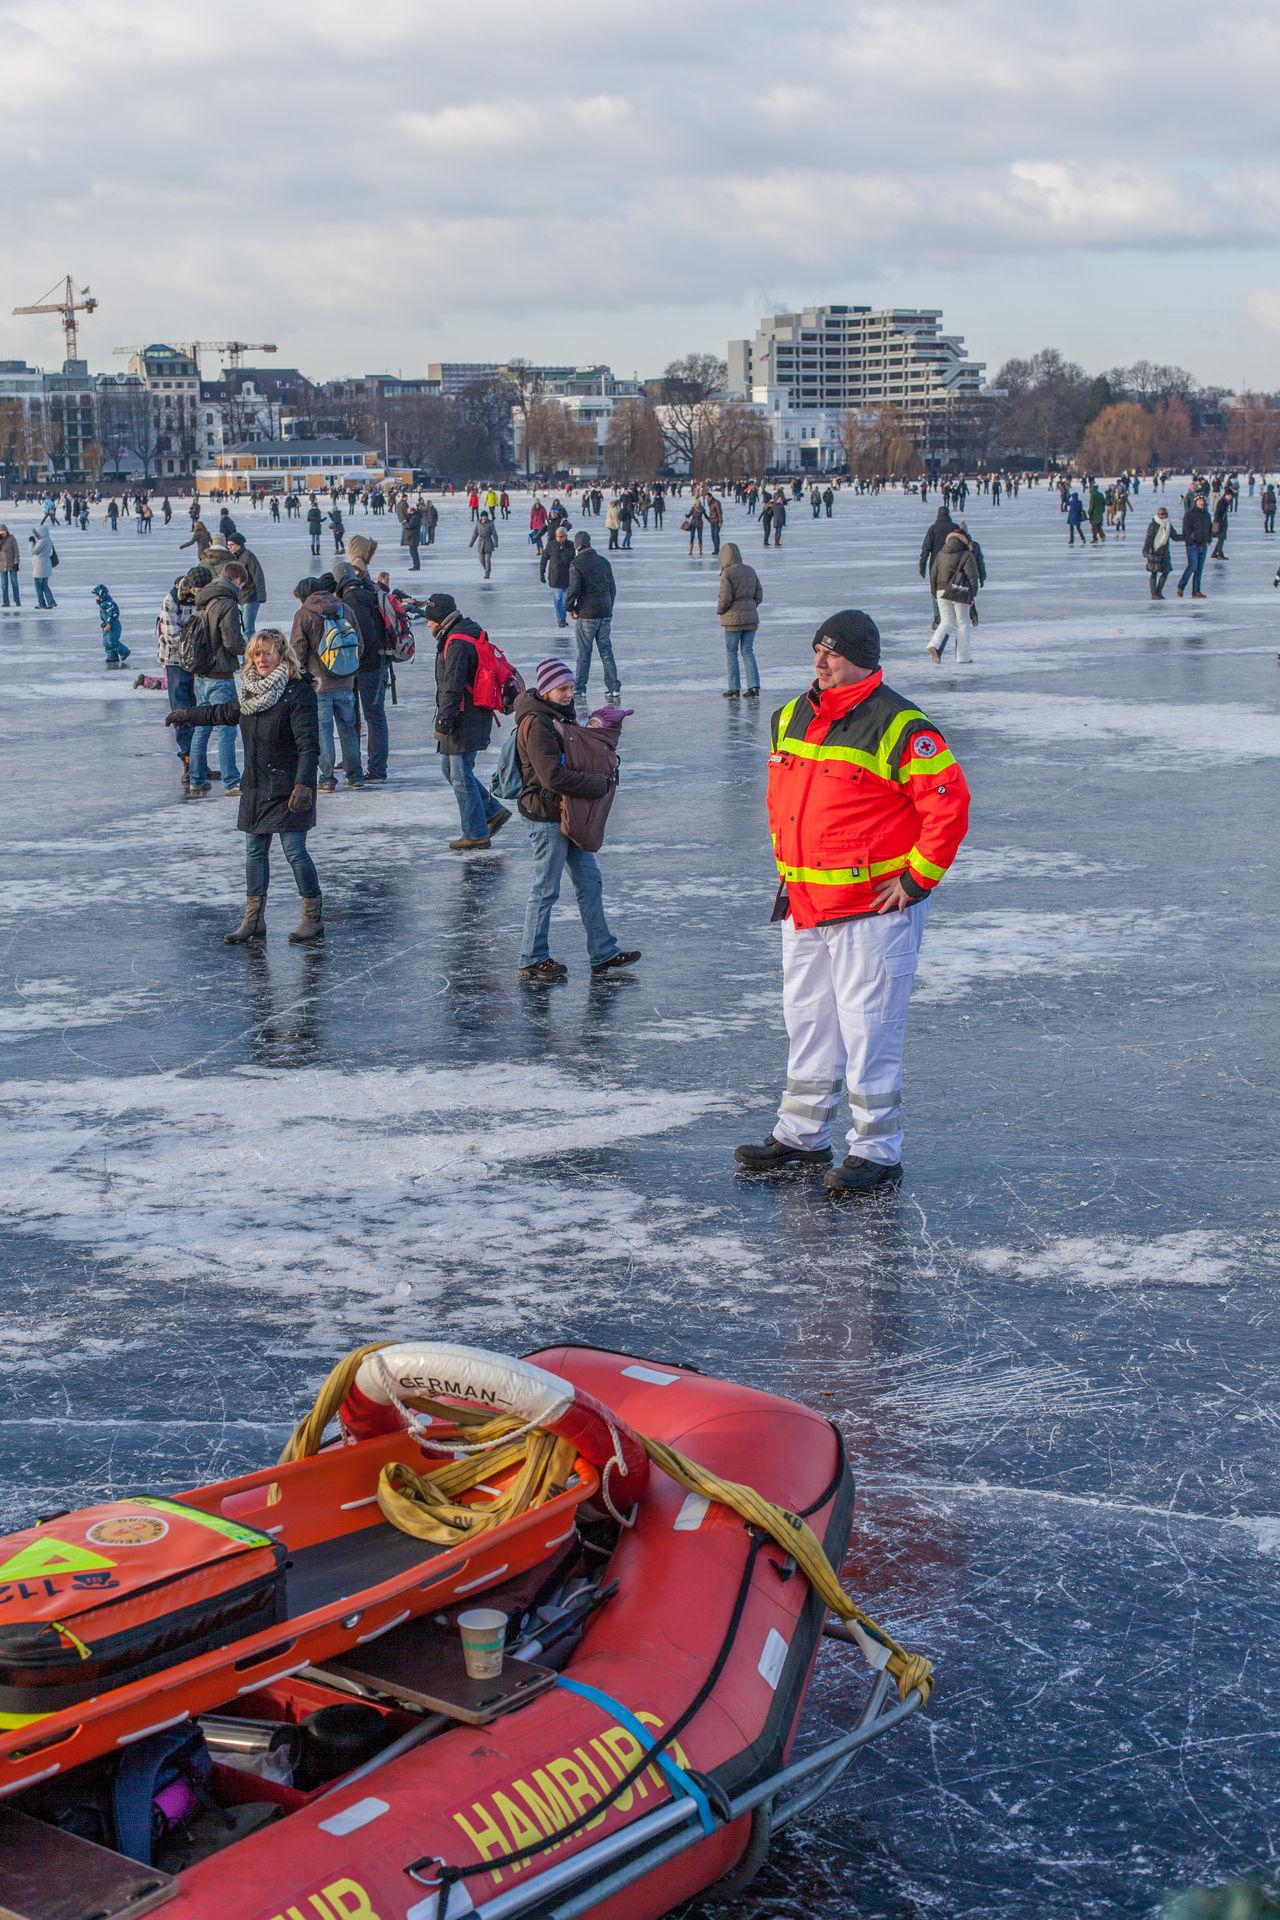 Adventure Alster Ambulance Boat Ambulance Staff City Cityscape Day Hamburg Ice Ice Skating Outdoors People Water Winter